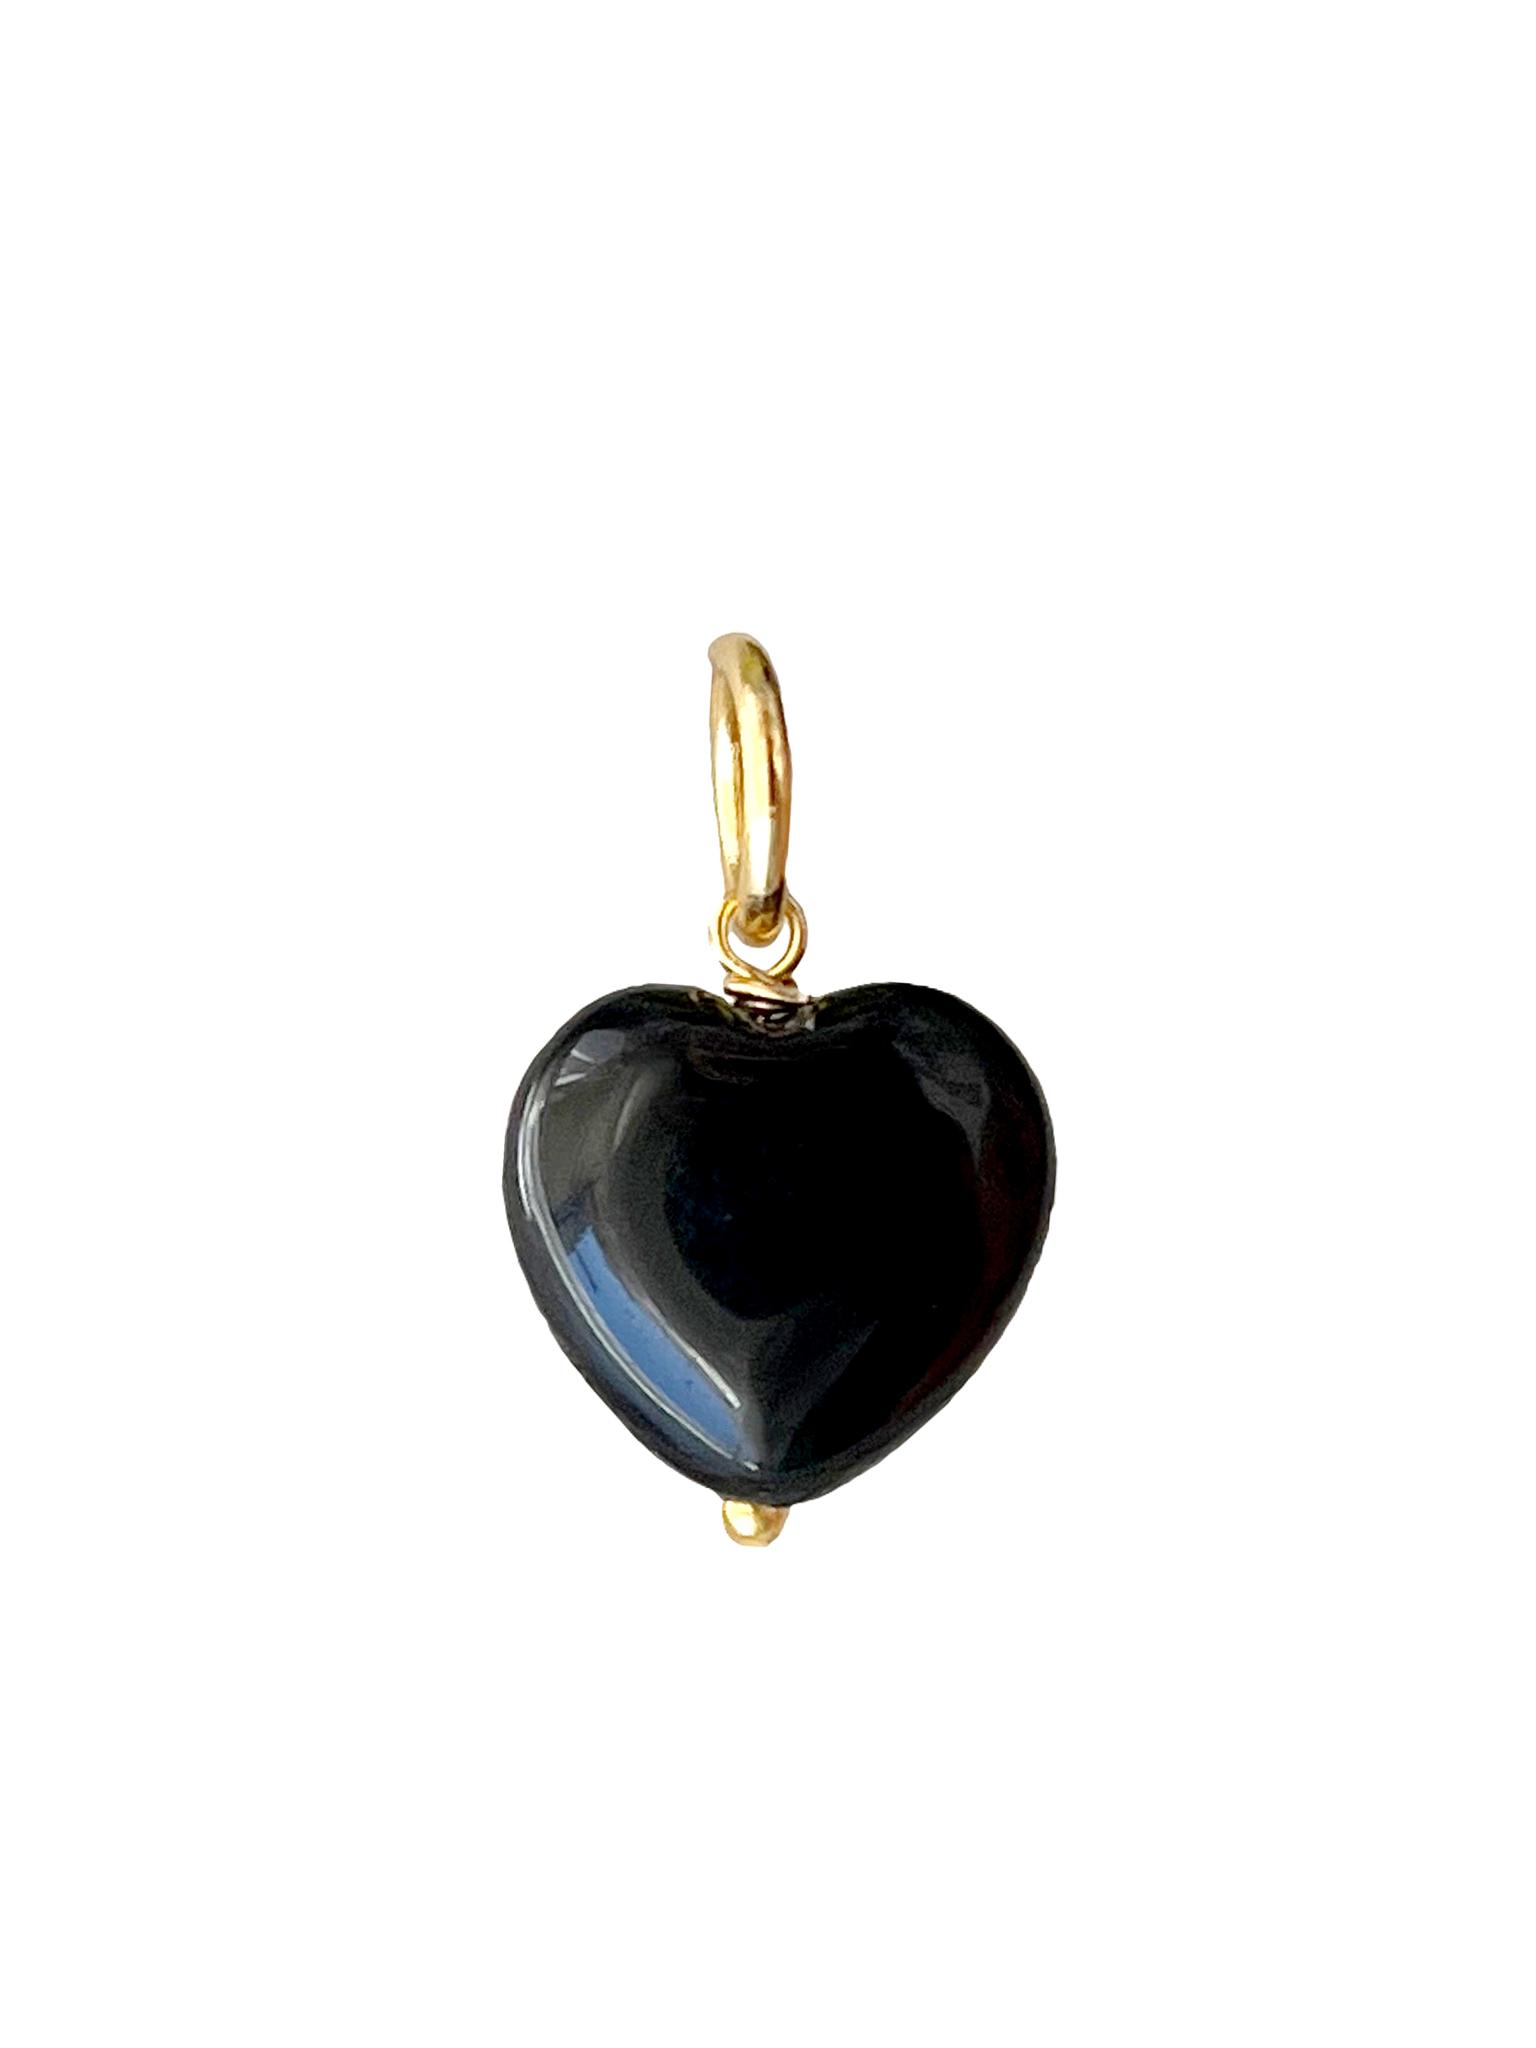 Подвеска Сердце из камня 12 мм / black agate /